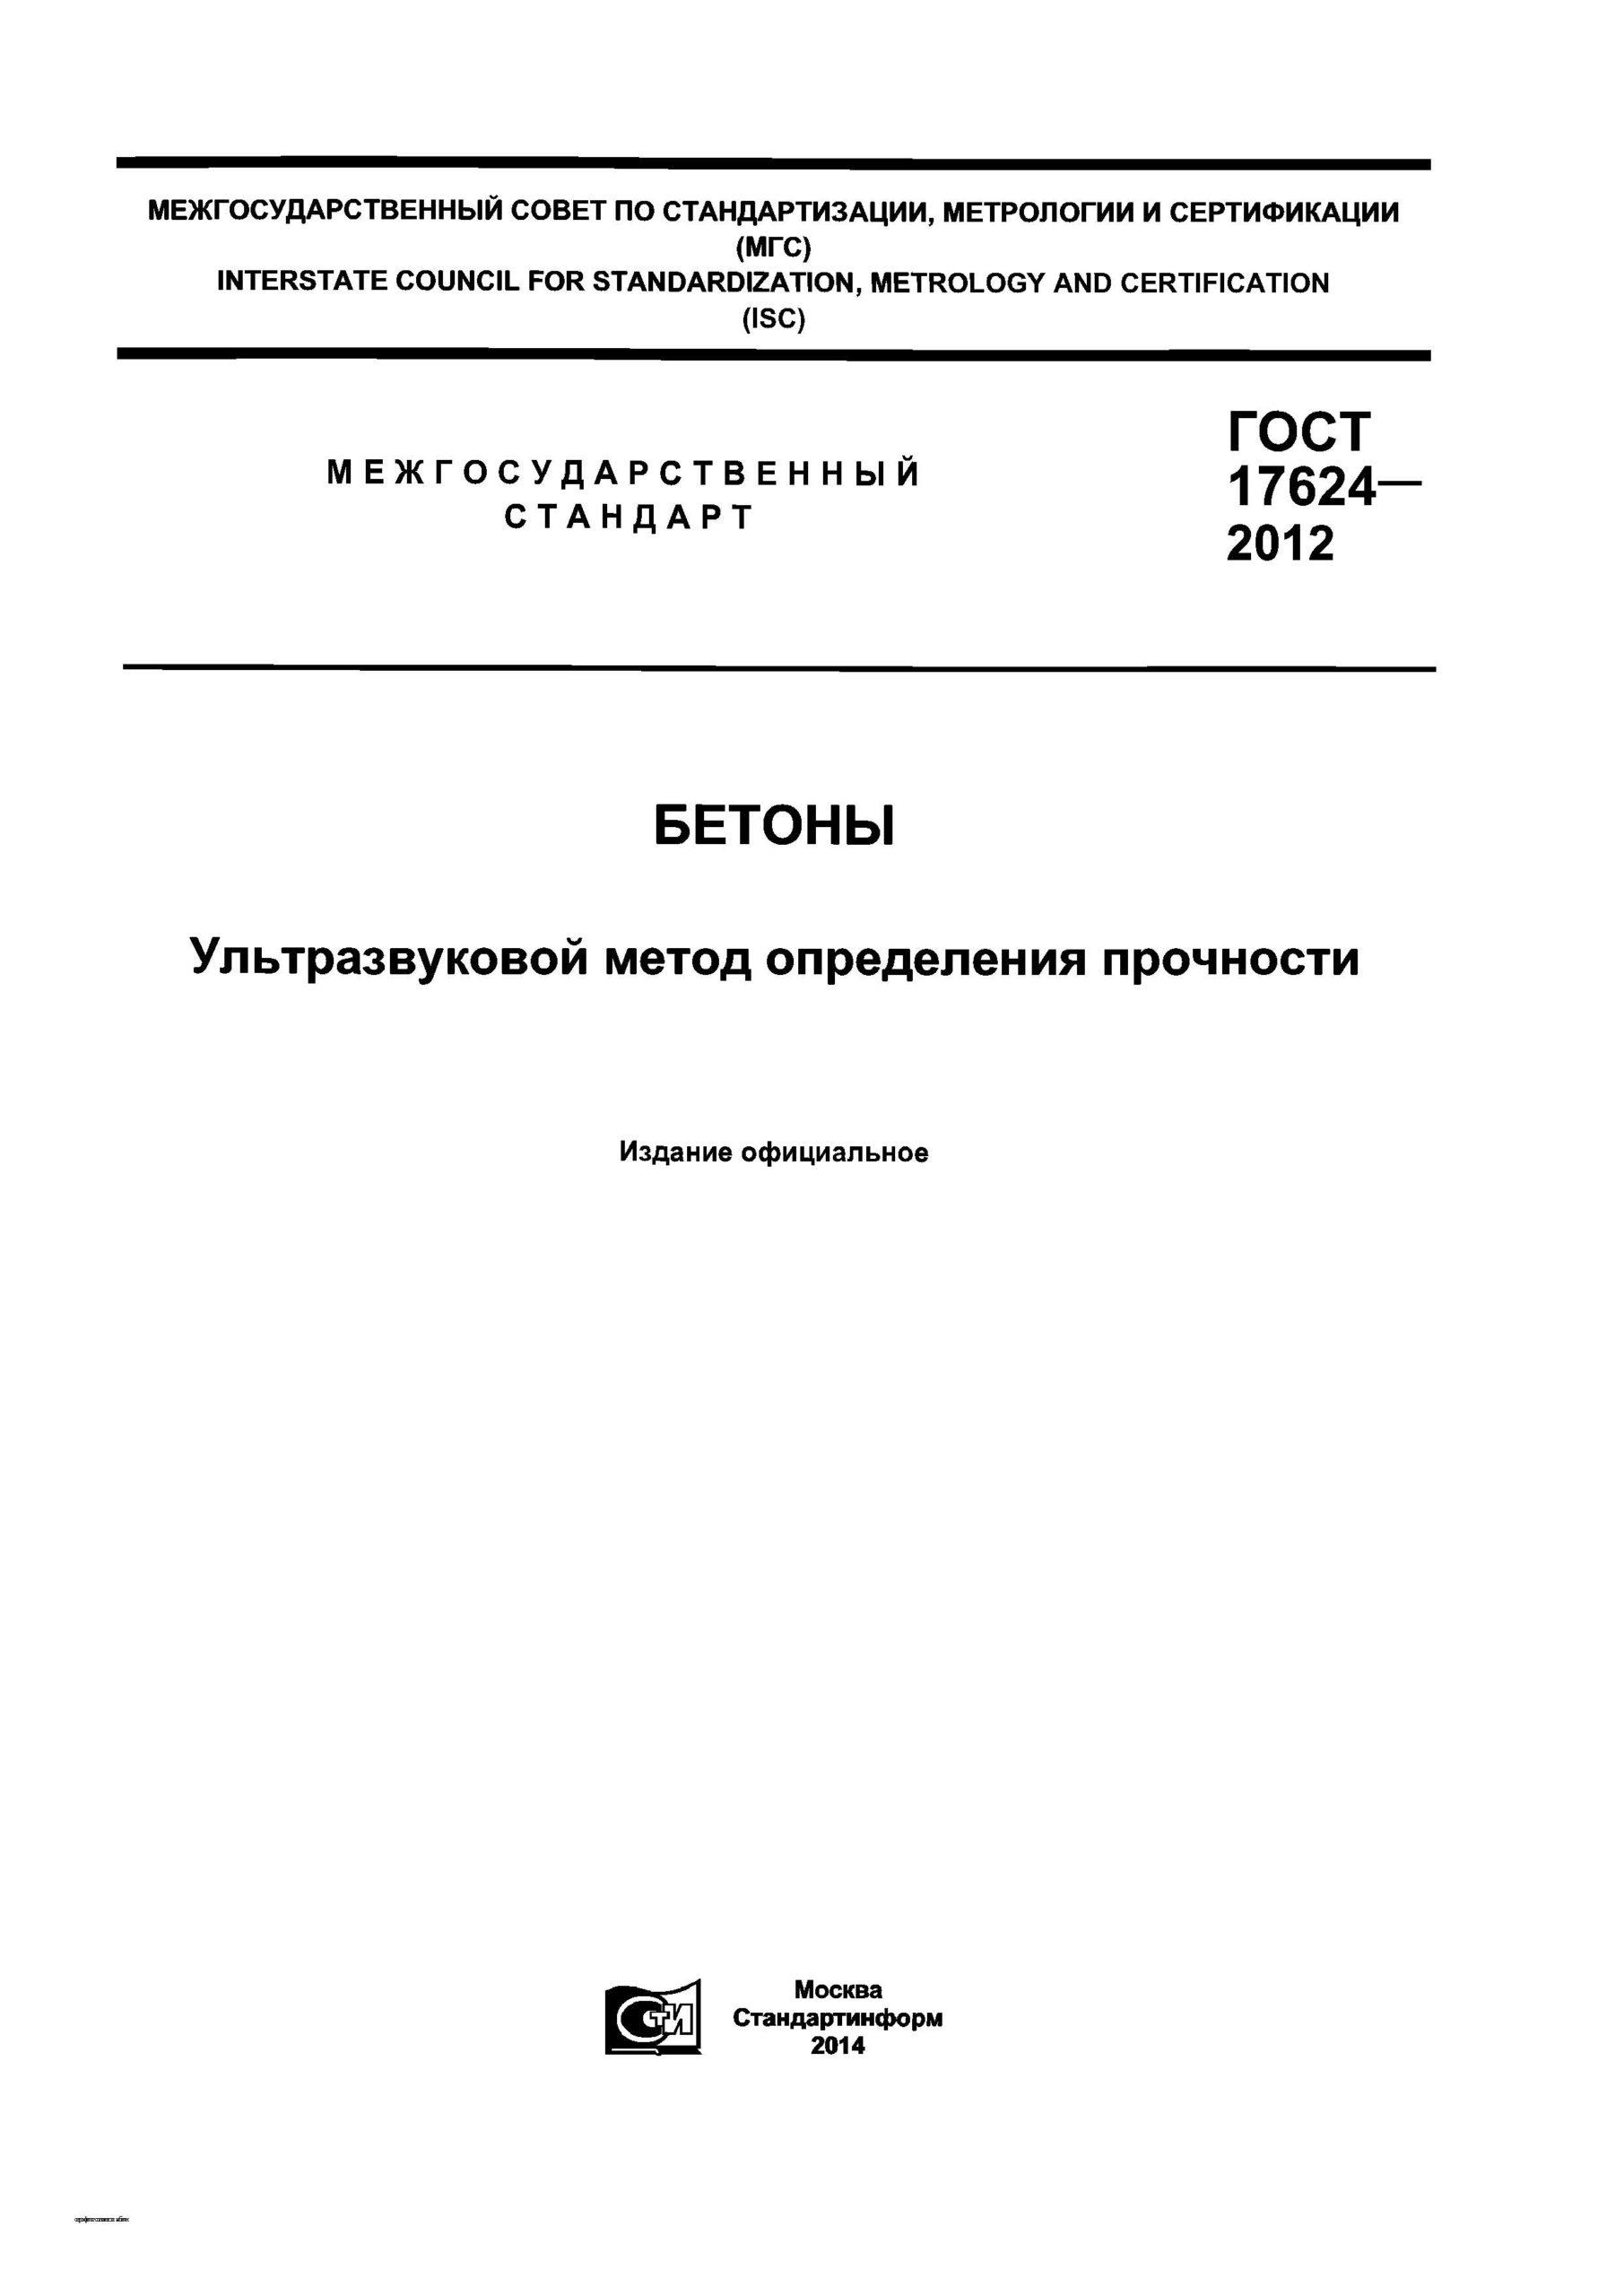 ГОСТ 17624-2012